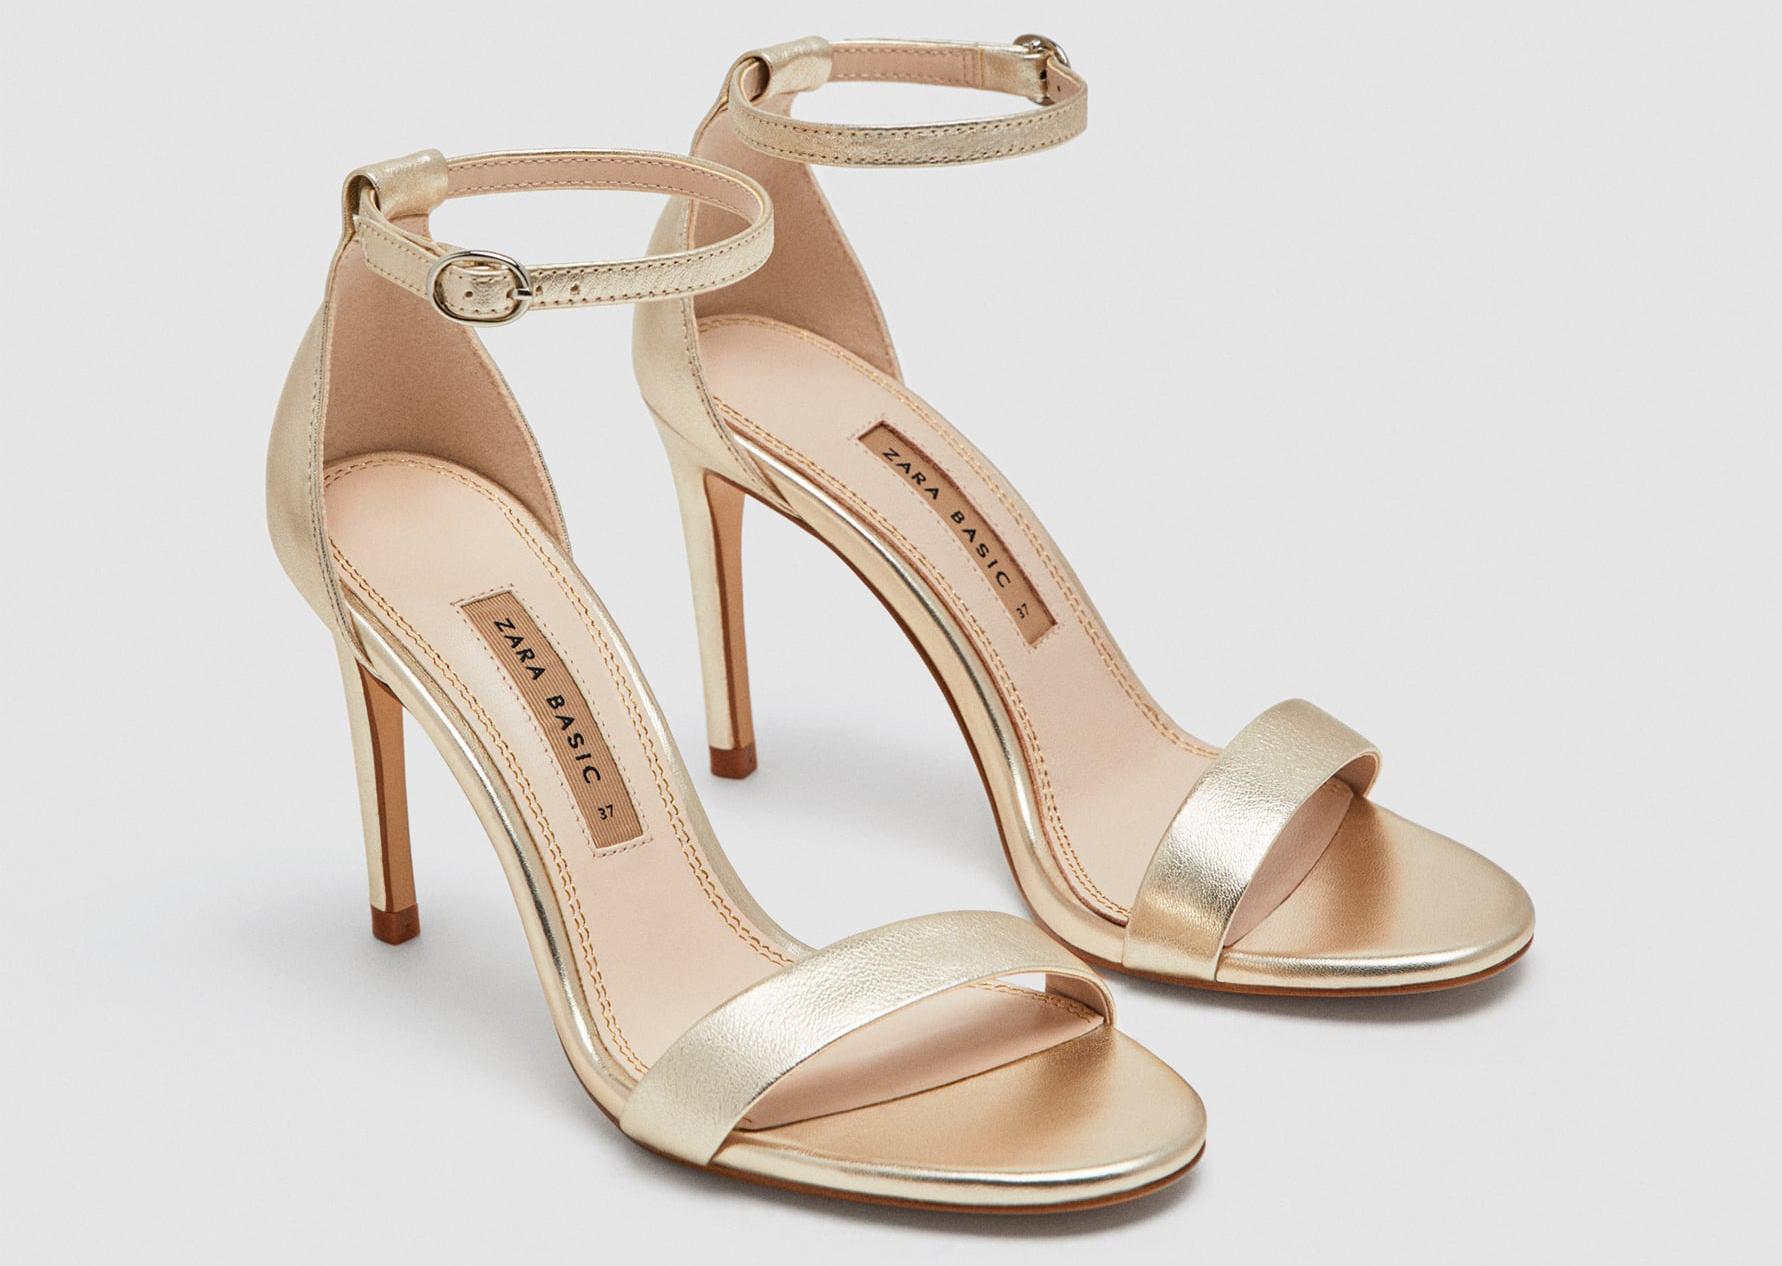 Metallic Ankle Strap Sandal Save: Zara